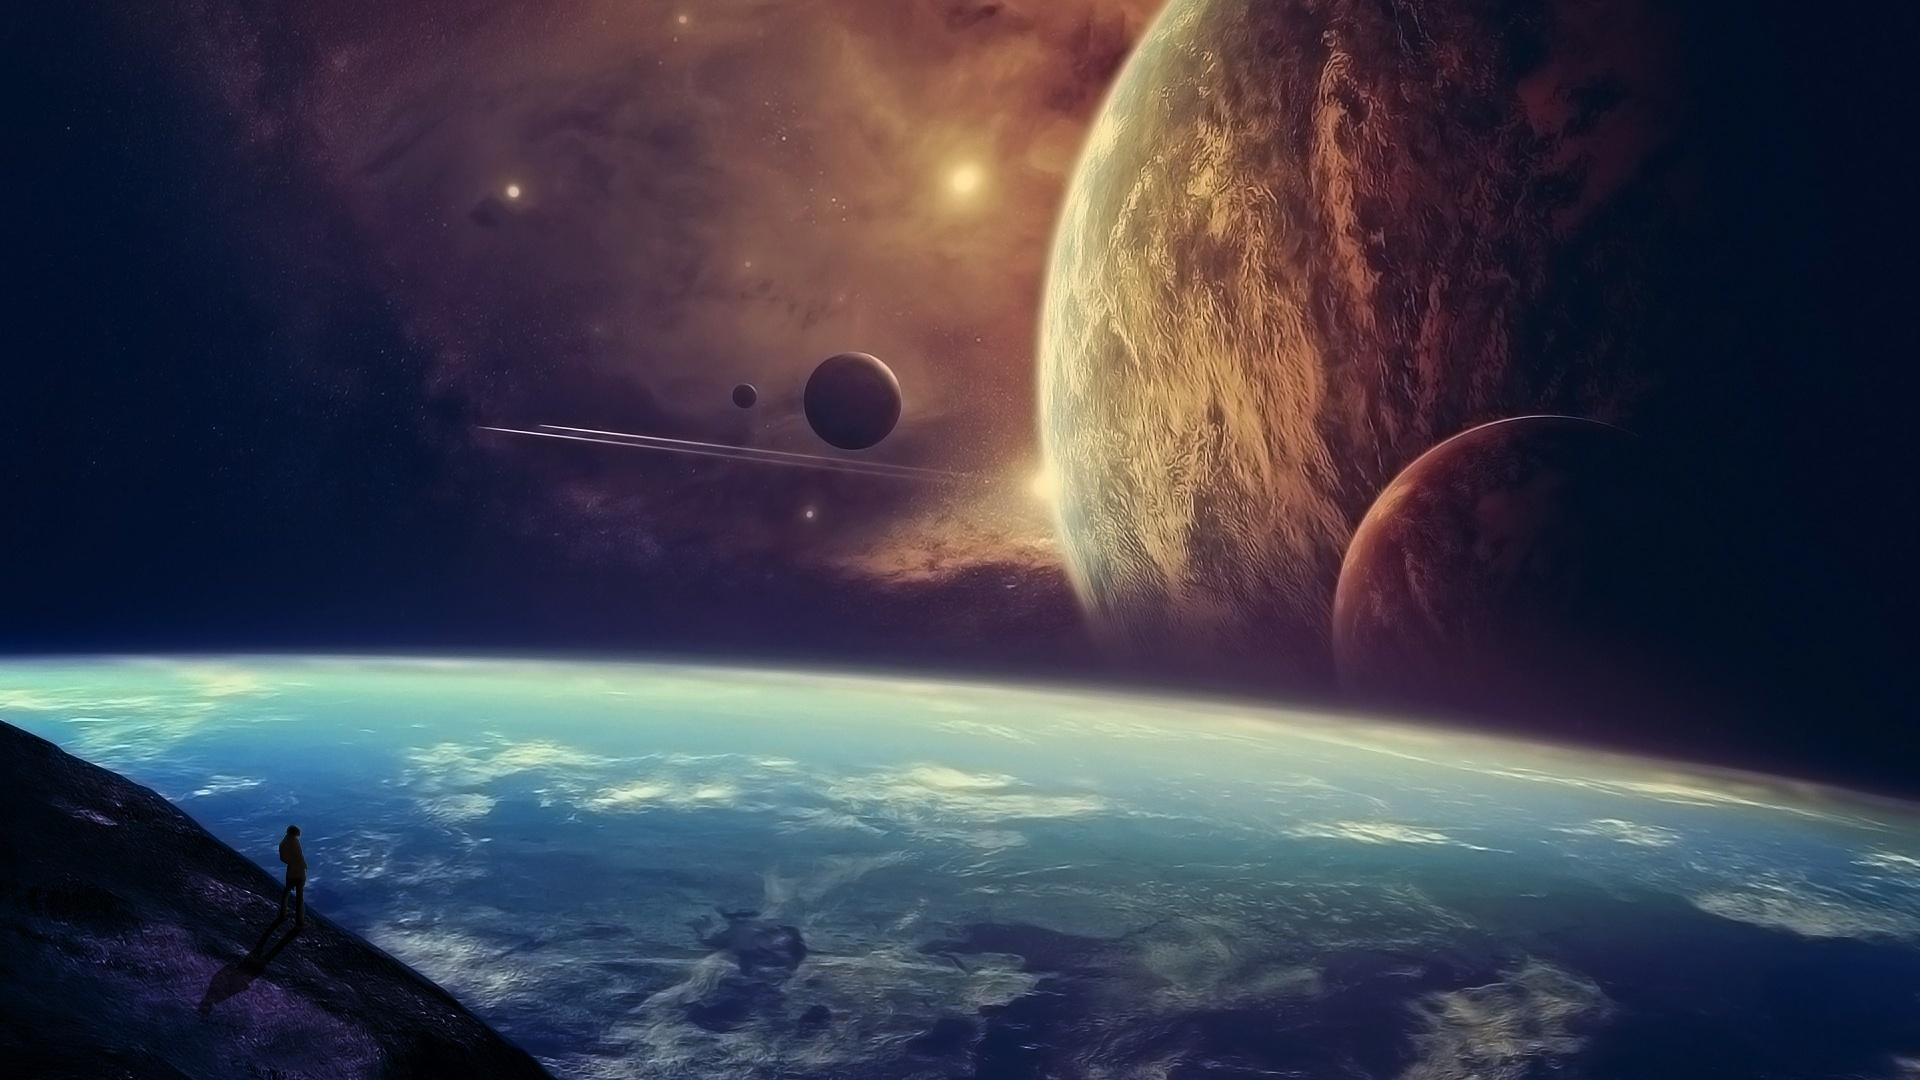 Space Earth Wallpaper Sf Wallpaper